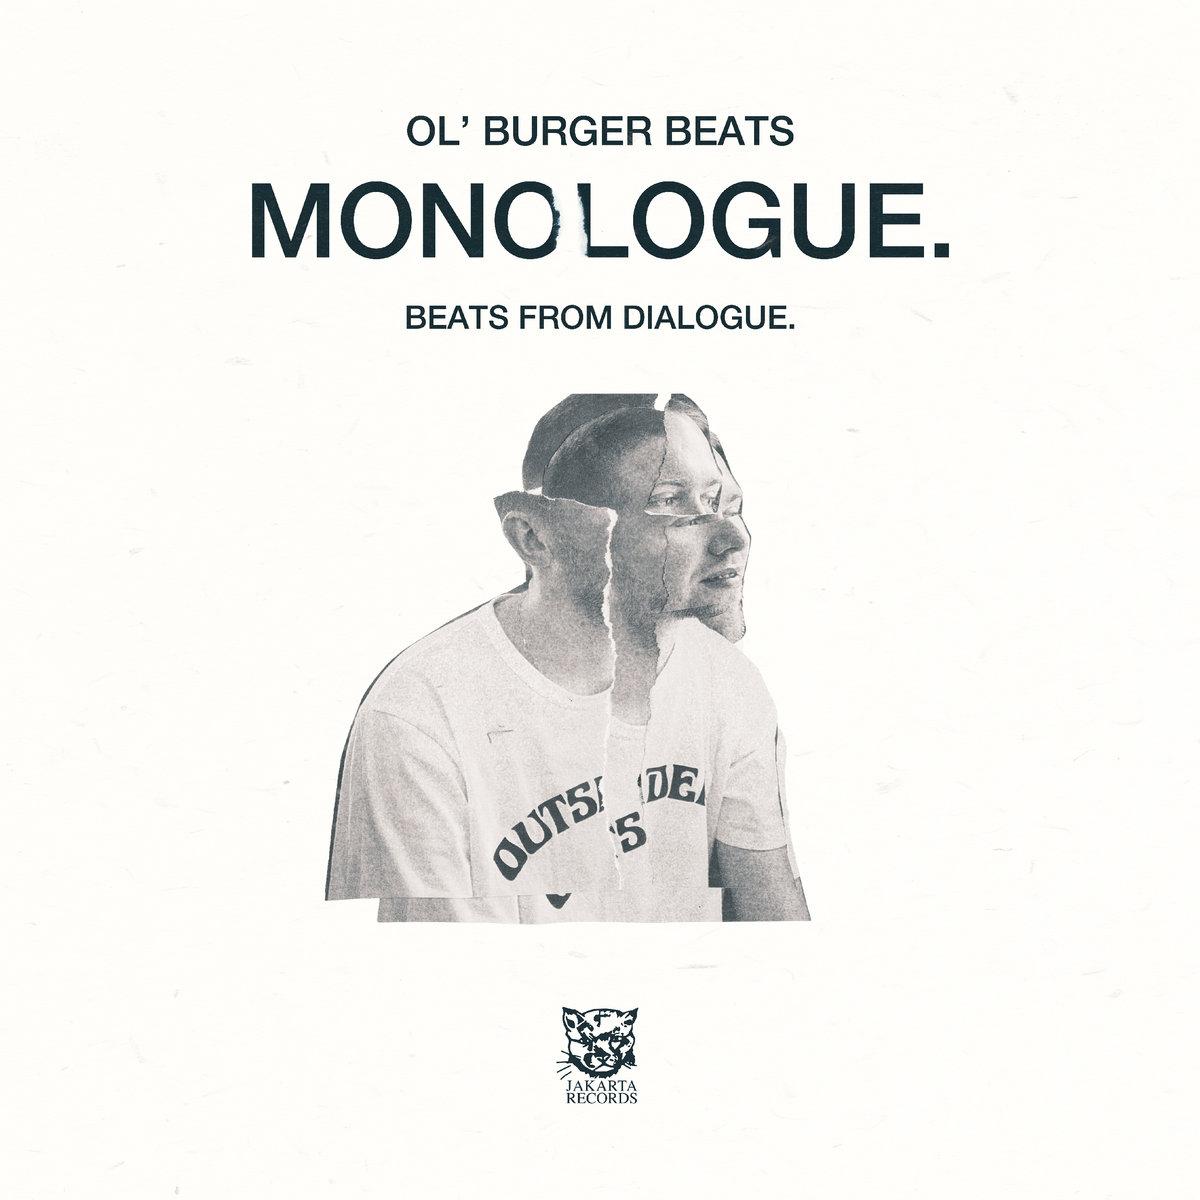 Ol' Burger Beats - Monologue. [LP]